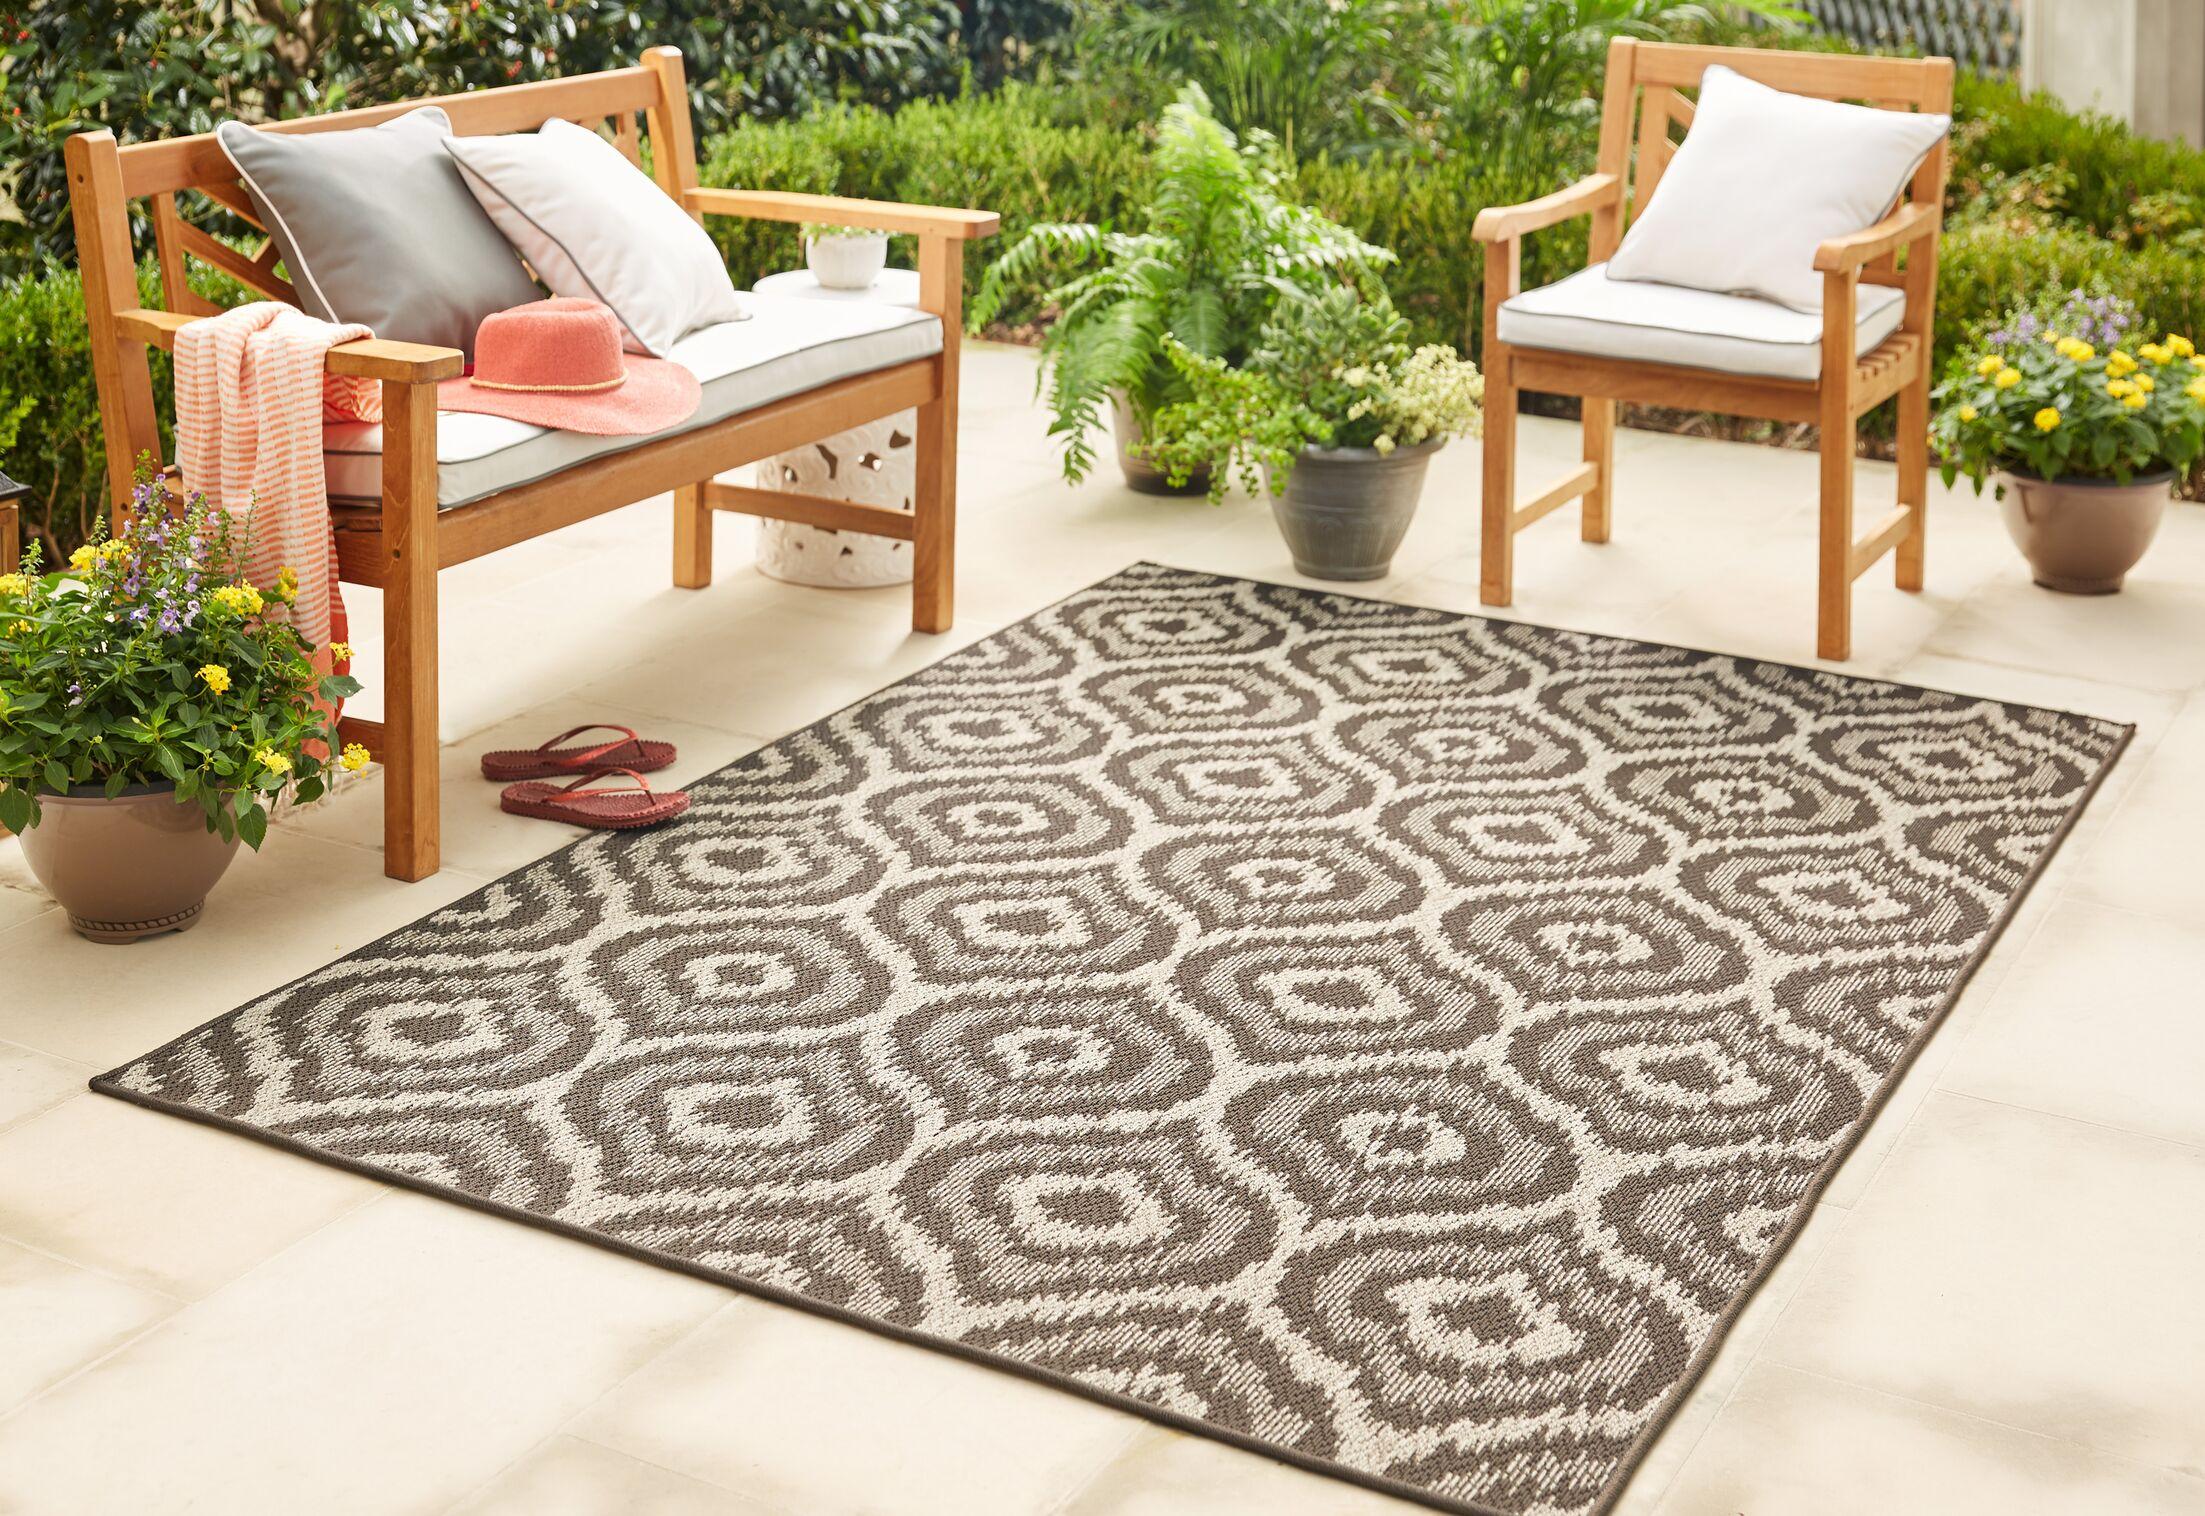 Holubov Indoor/Outdoor Area Rug Rug Size: Rectangle 5'3